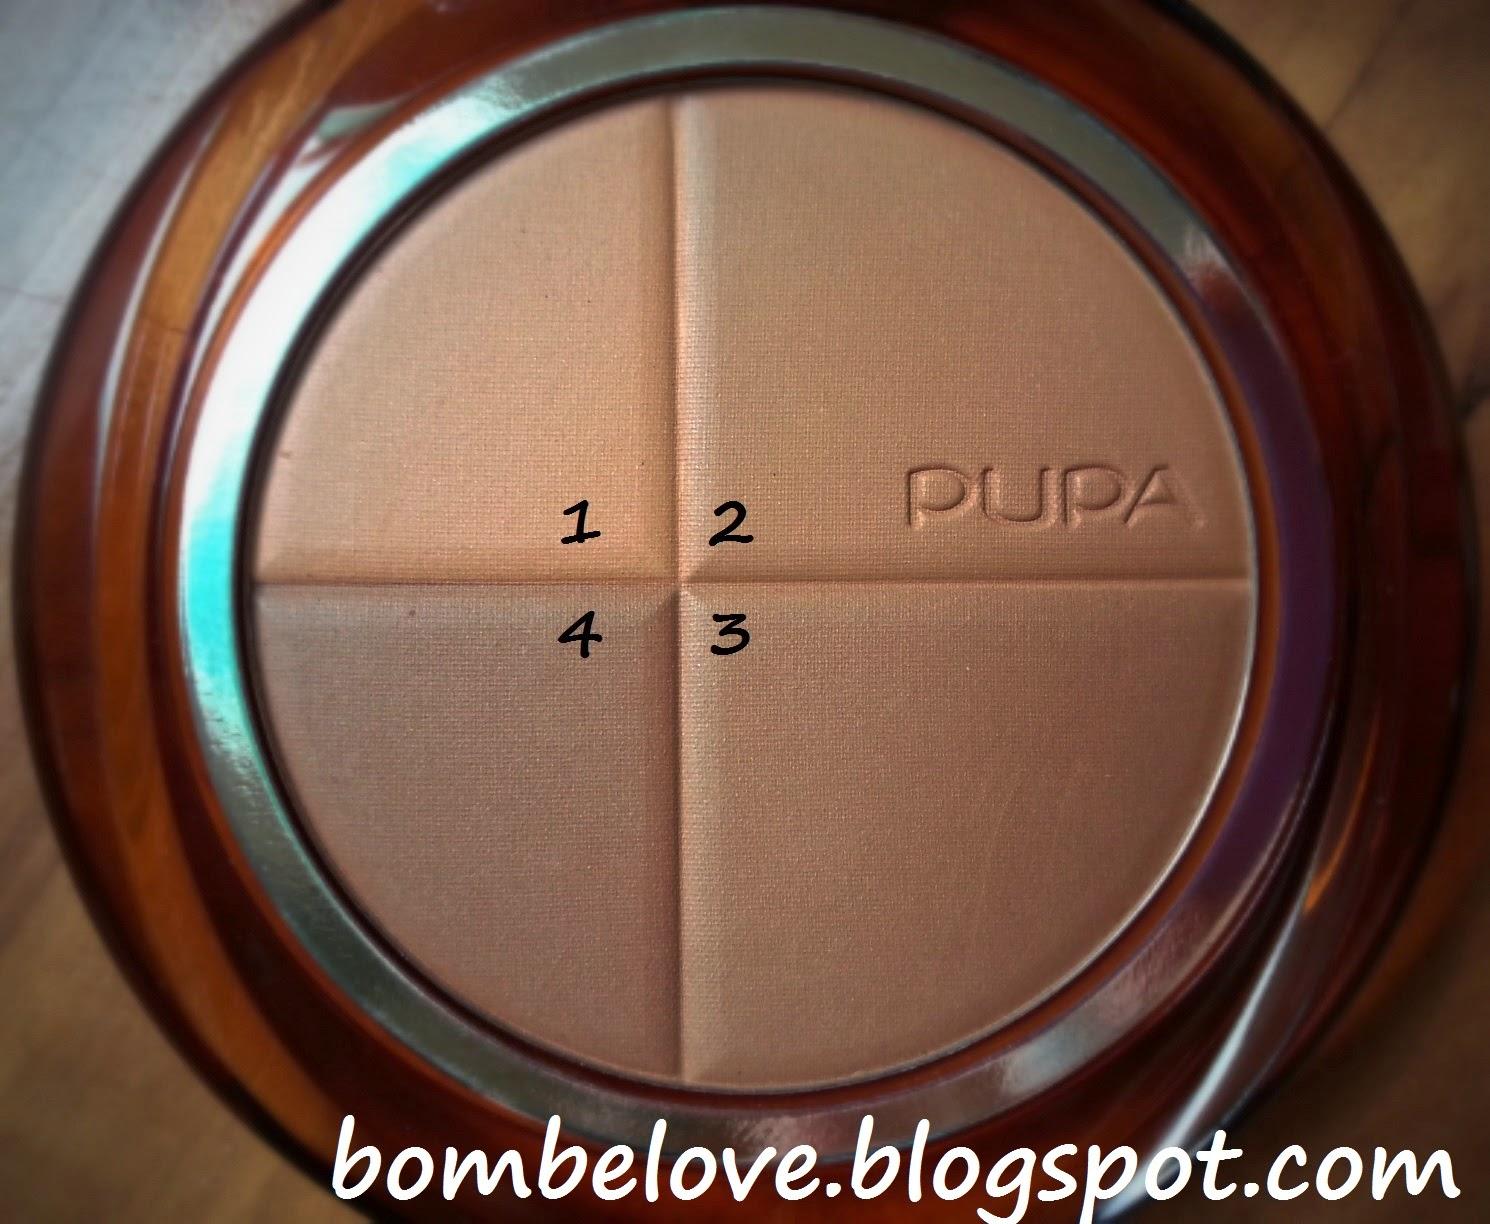 PUPA 4sun bronzing powder puder brązujący bombelove.blogspot.com